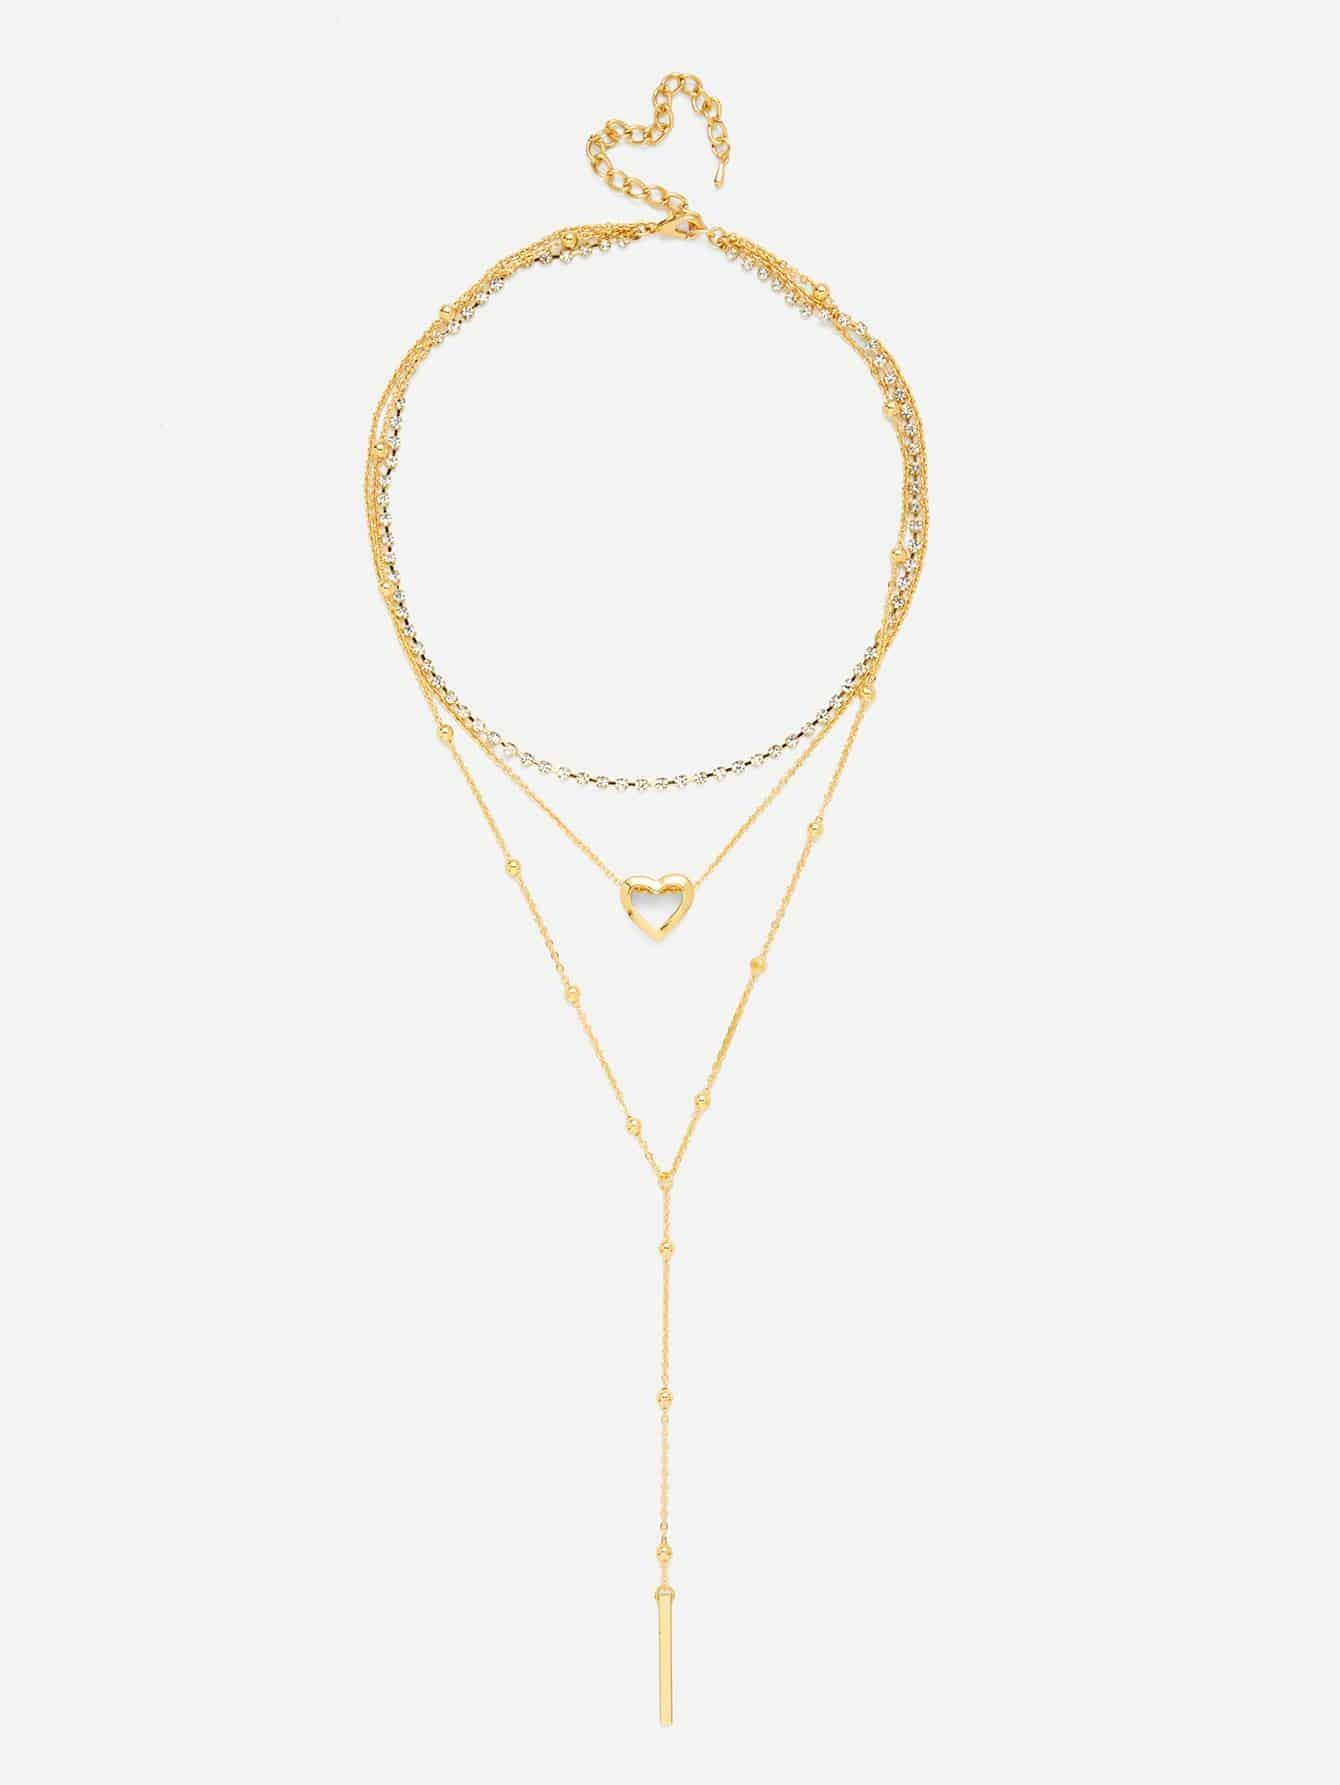 Heart & Bar Pendant Chain Layered Necklace heart pendant beaded layered necklace